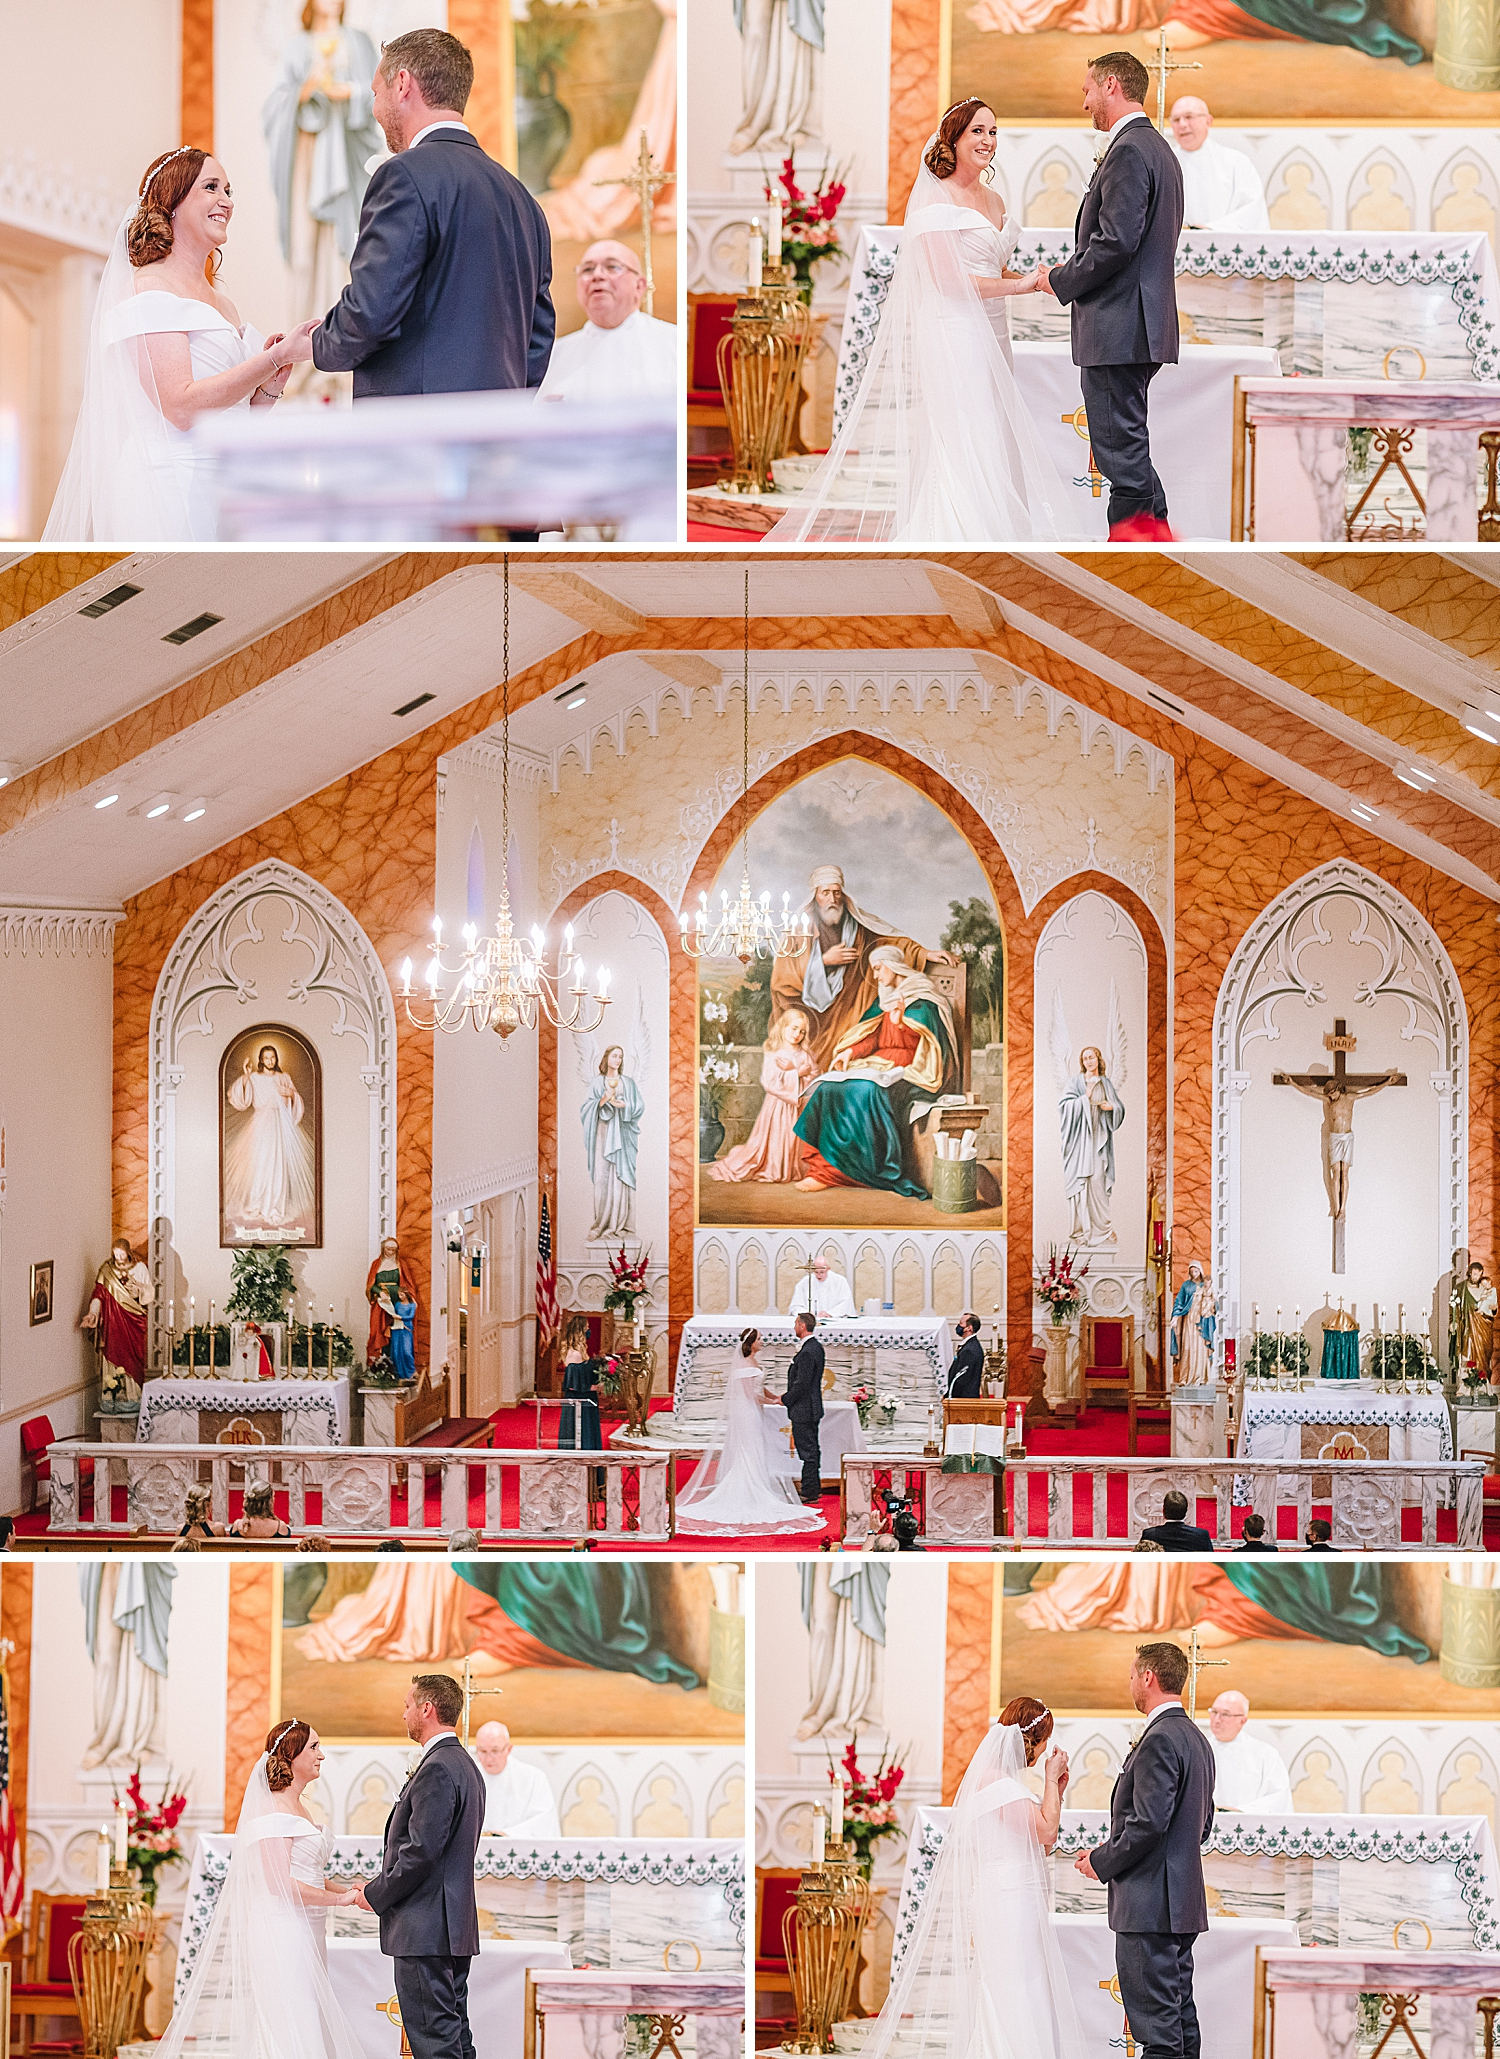 Jewel-Tone-Texas-Wedding-Valerie-Jason-Carly-Barton-Photography_0044.jpg